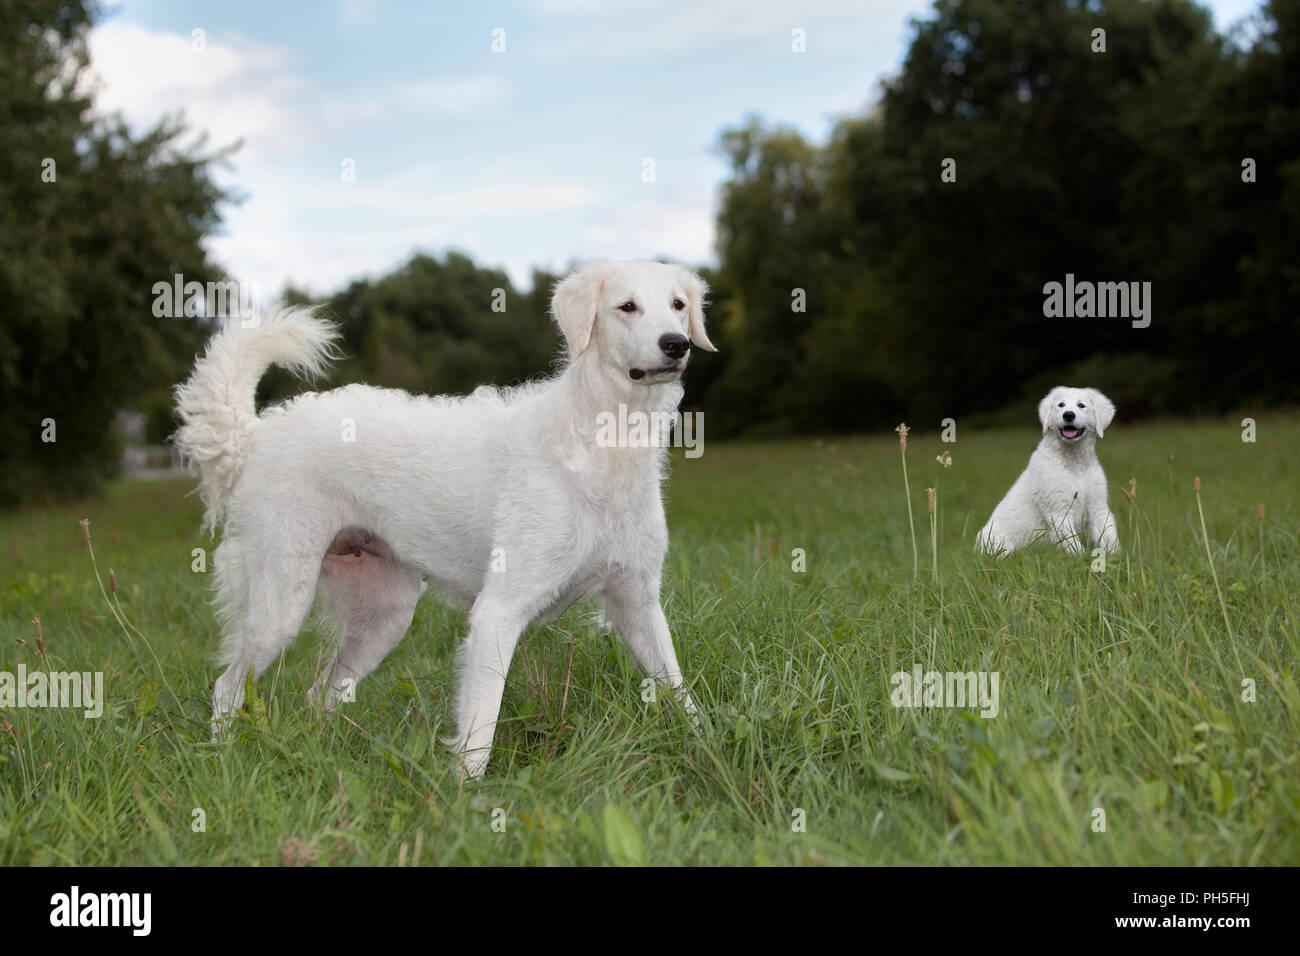 Kuvacz, ungarischer Hirtenhunde, hungarian vcanis lupus familiy pet Herdenschutzhund Muttertier Welpen im Hintergrund - Stock Image